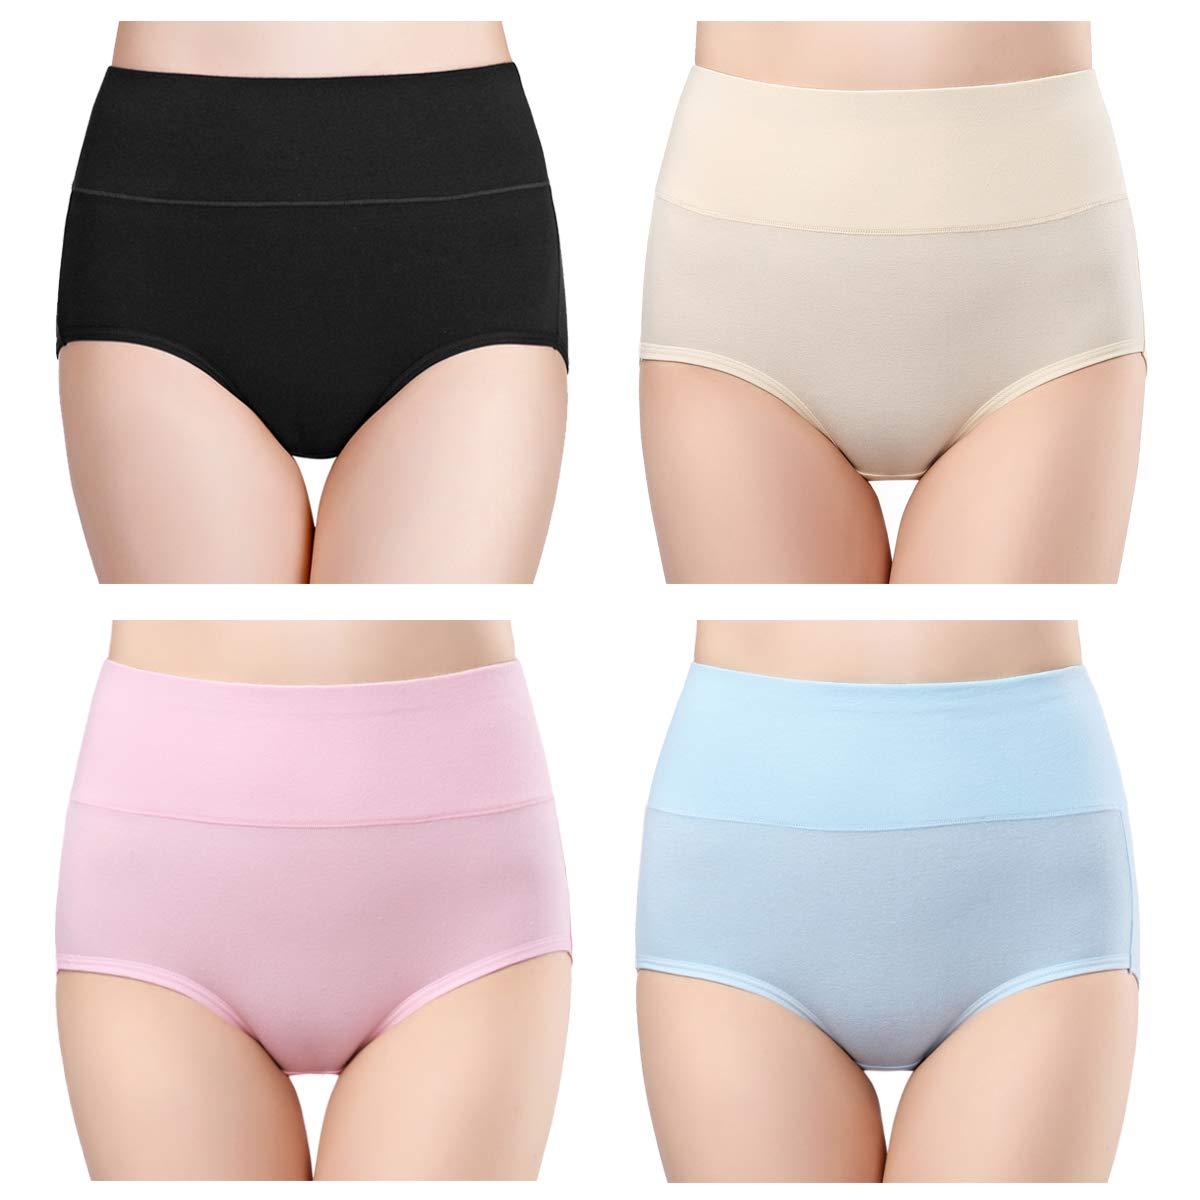 Women's High Waisted Cotton Underwear Ladies Soft Full Briefs Panties Multipack